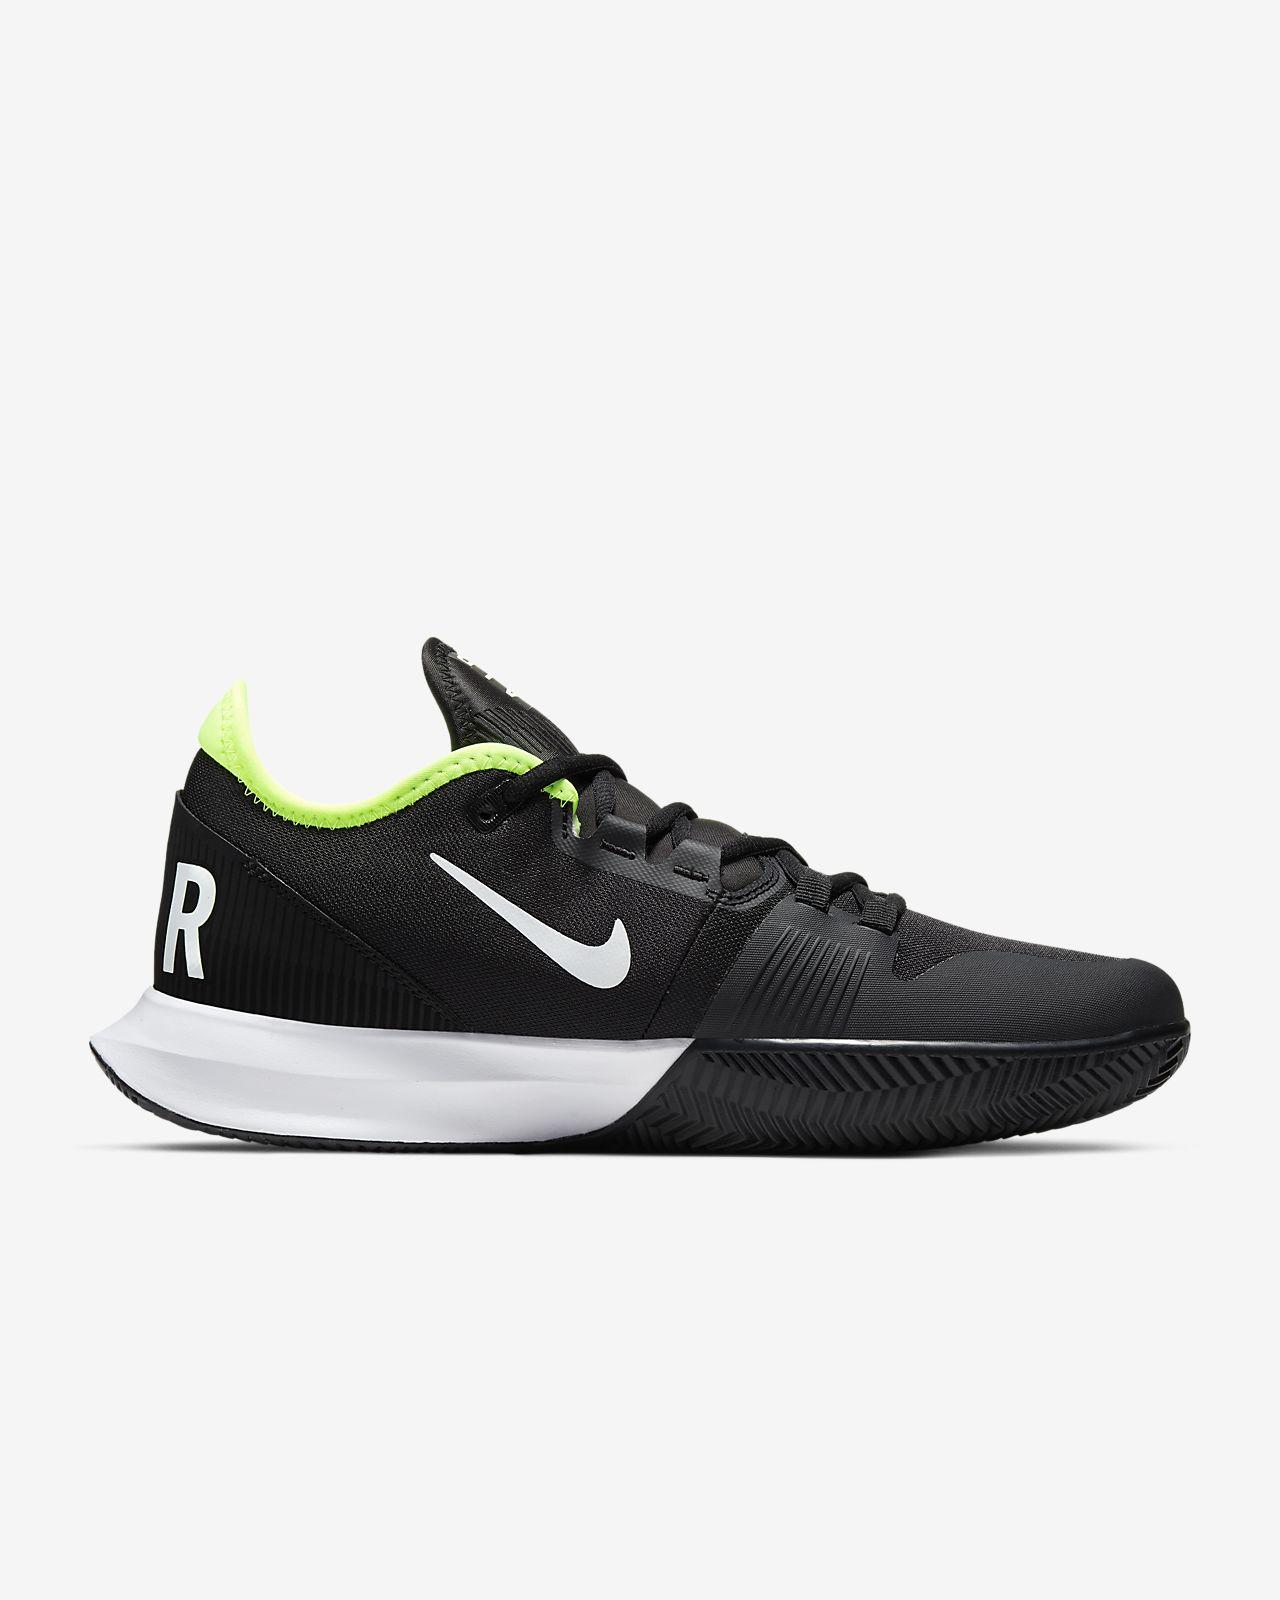 Nike Air VaporMax Plus BlackVolt White, Mens Nike Air Max Plus   Olympus MD